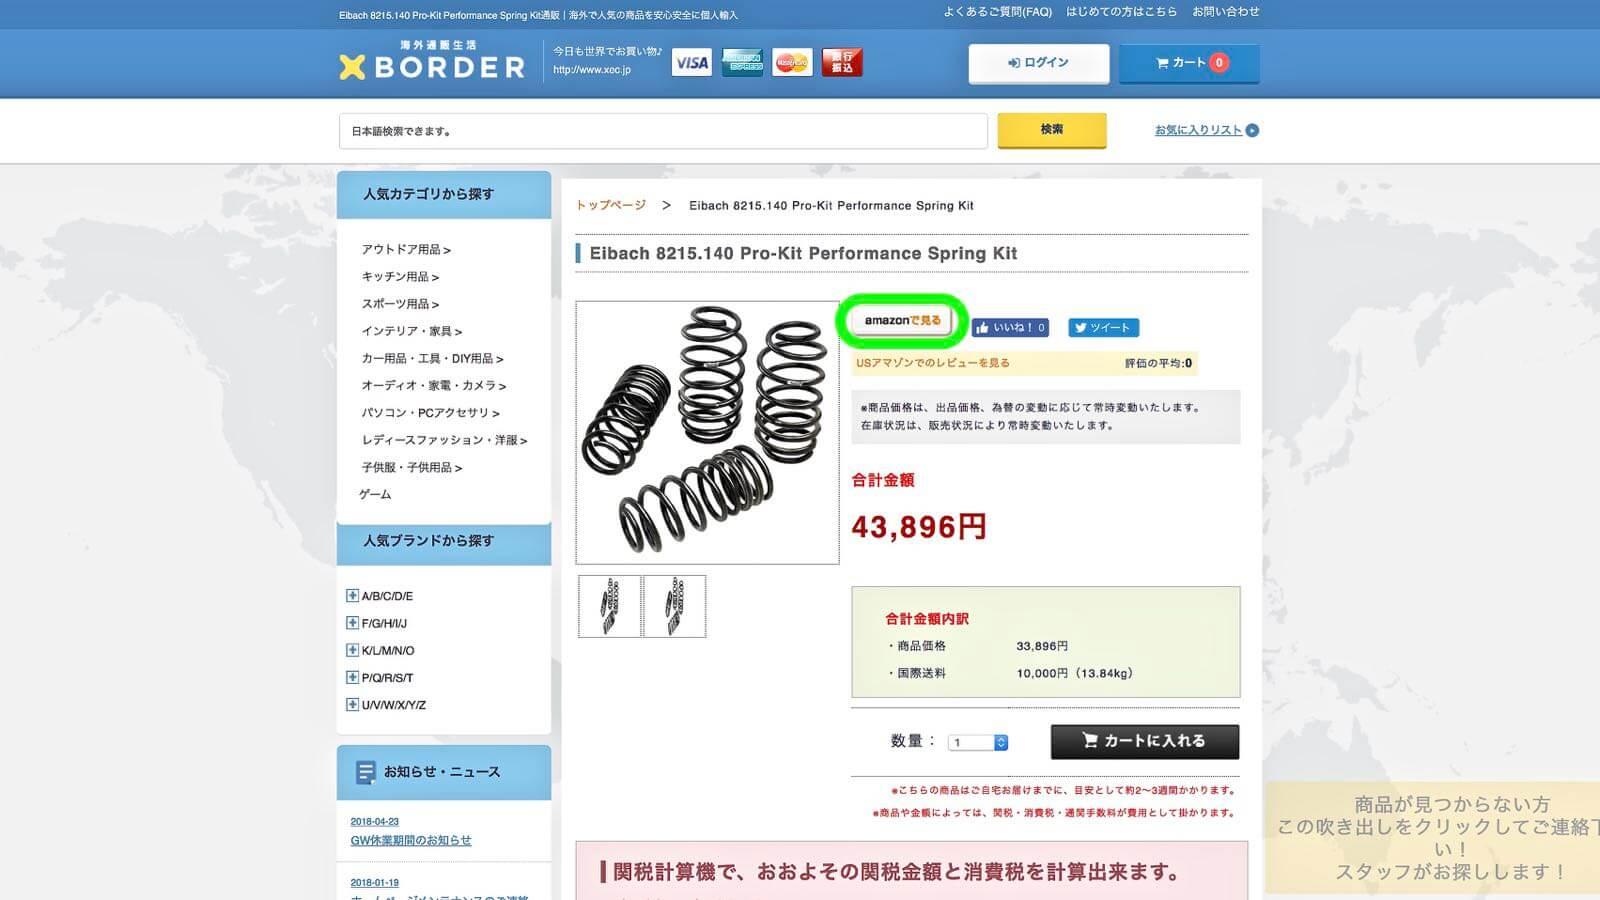 0145 MR2 Restore Plan  Part 18 11 XBORDER Border purchase screen